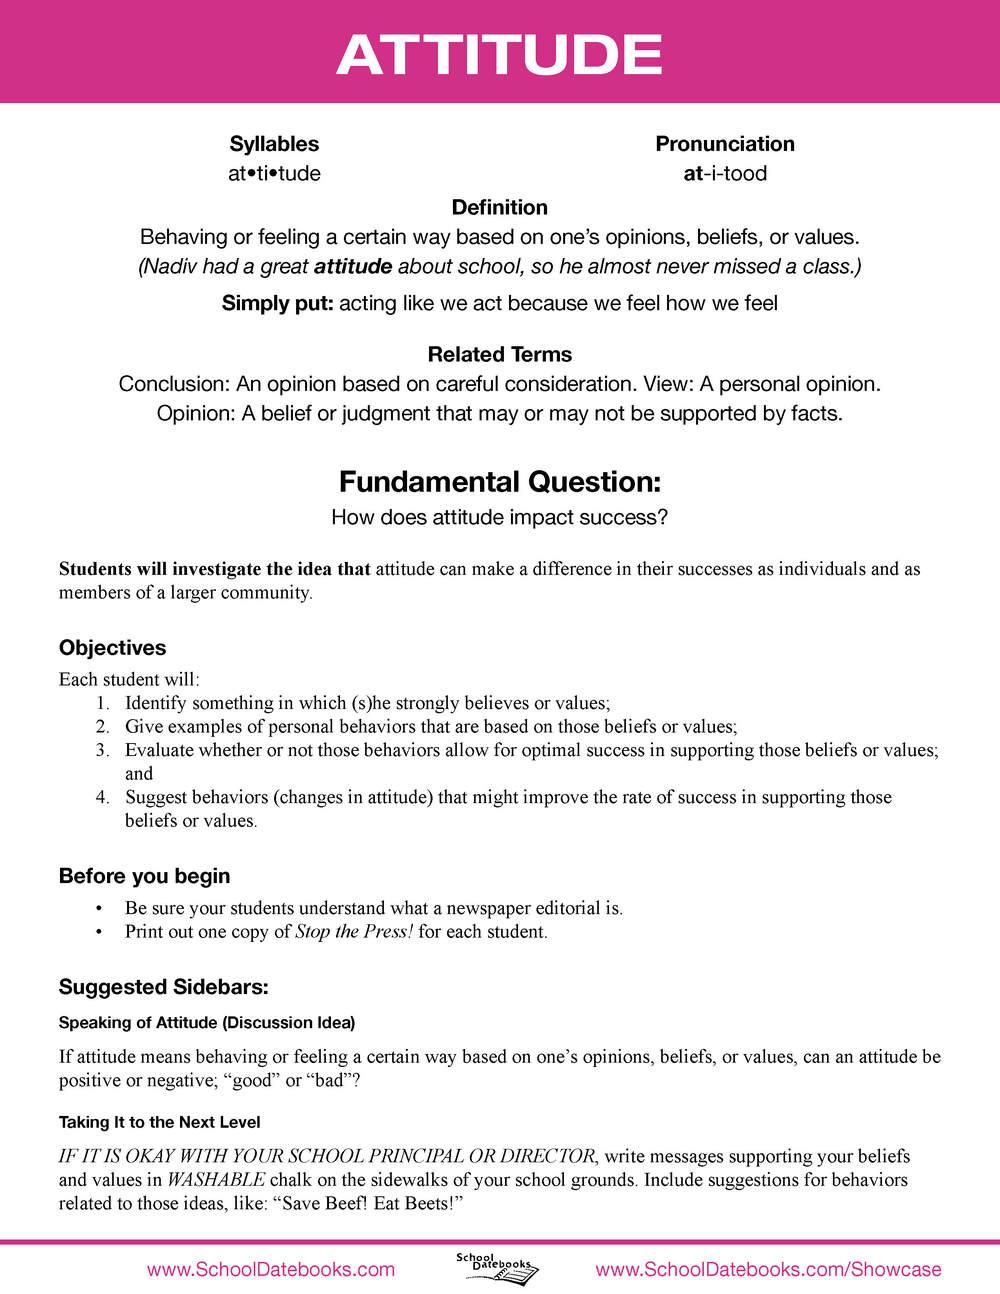 LessonPlan-Attitude_Page_1.jpg